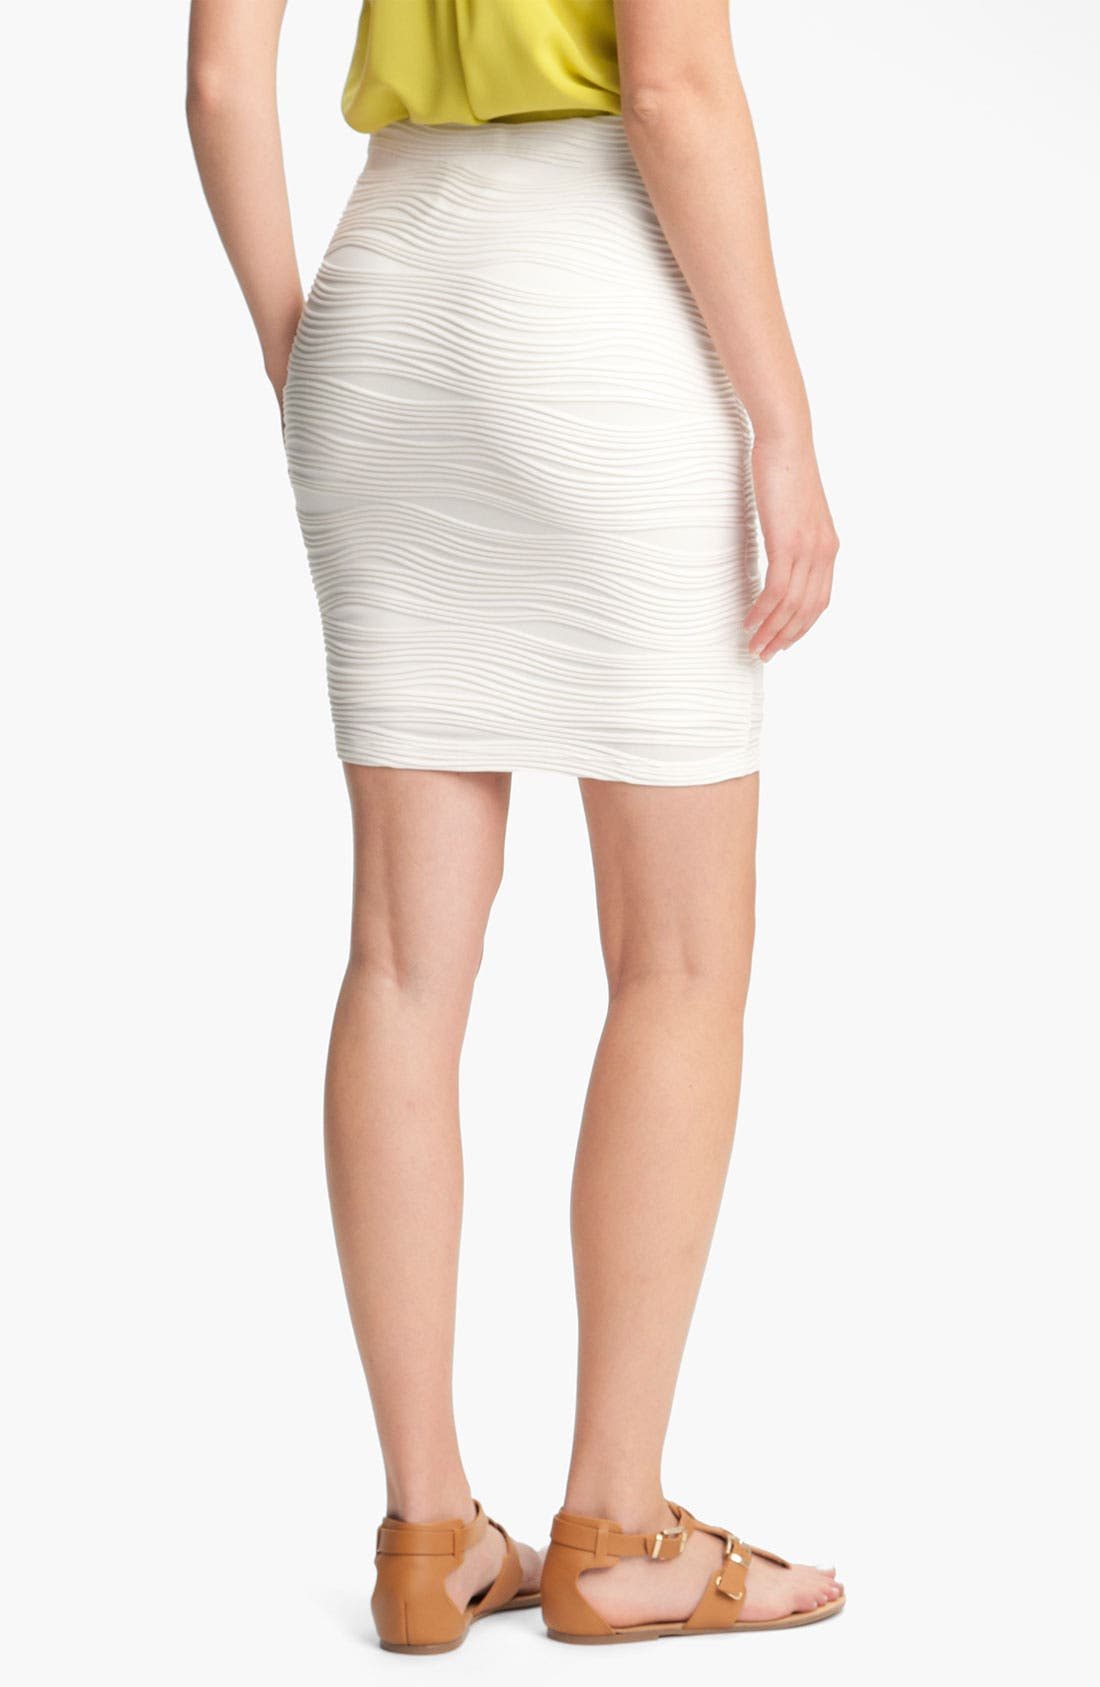 Alternate Image 2  - Lily White Textured Bandage Skirt (Juniors)